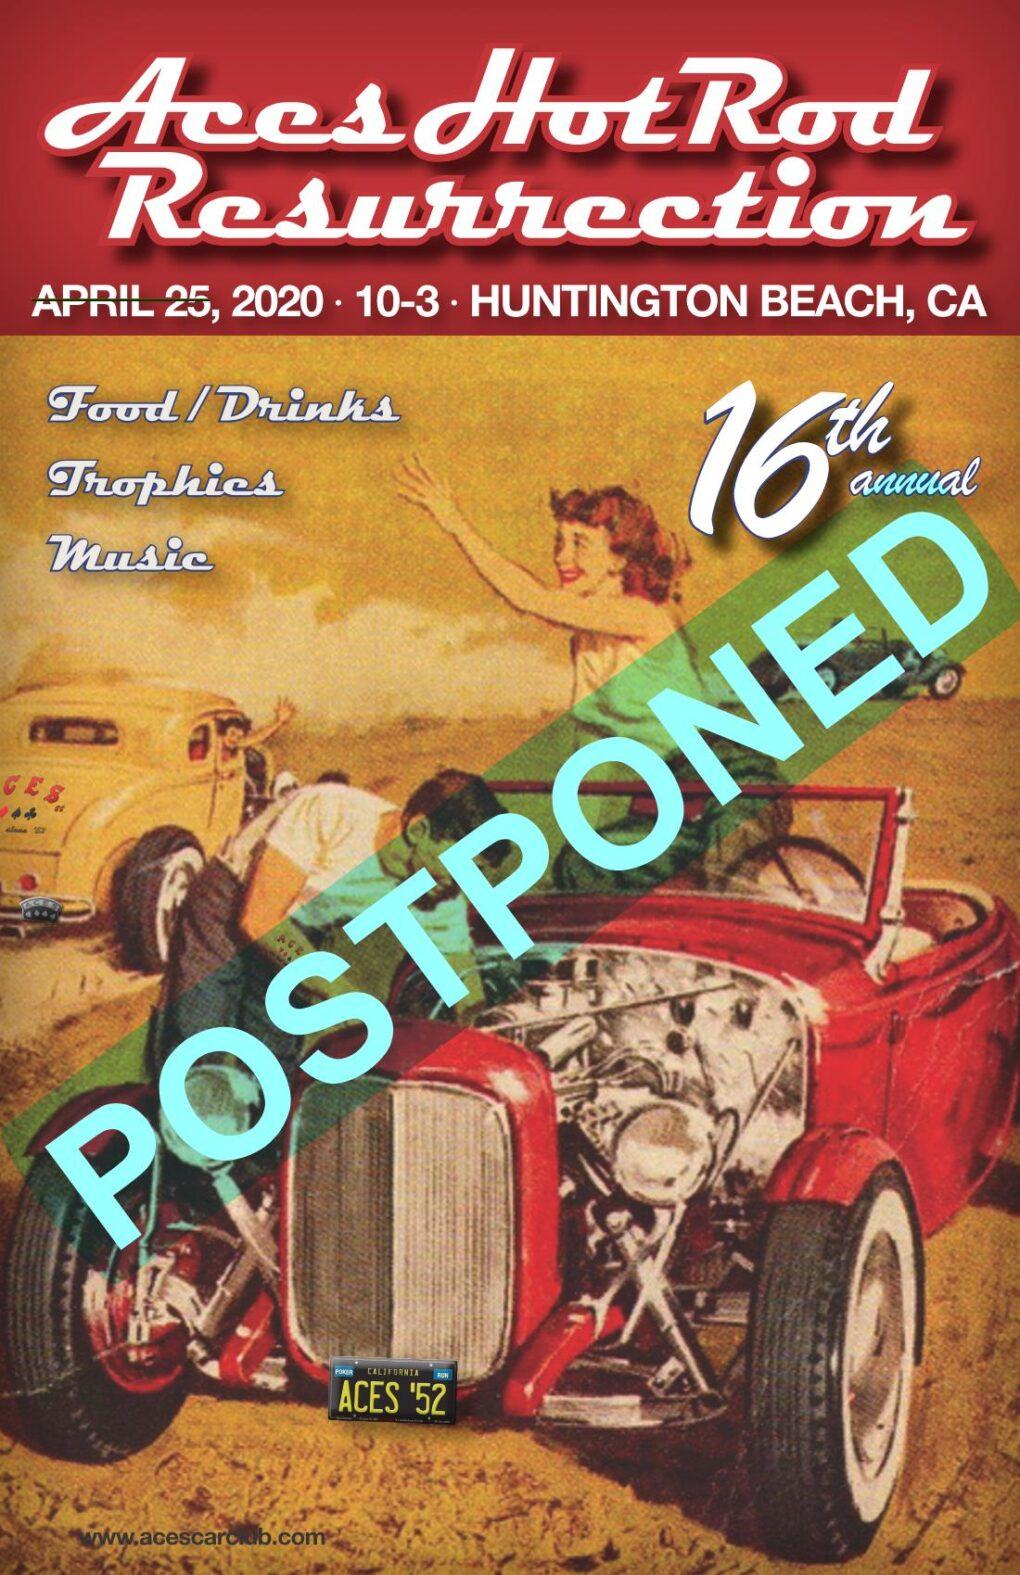 Postponed ACES Car Show